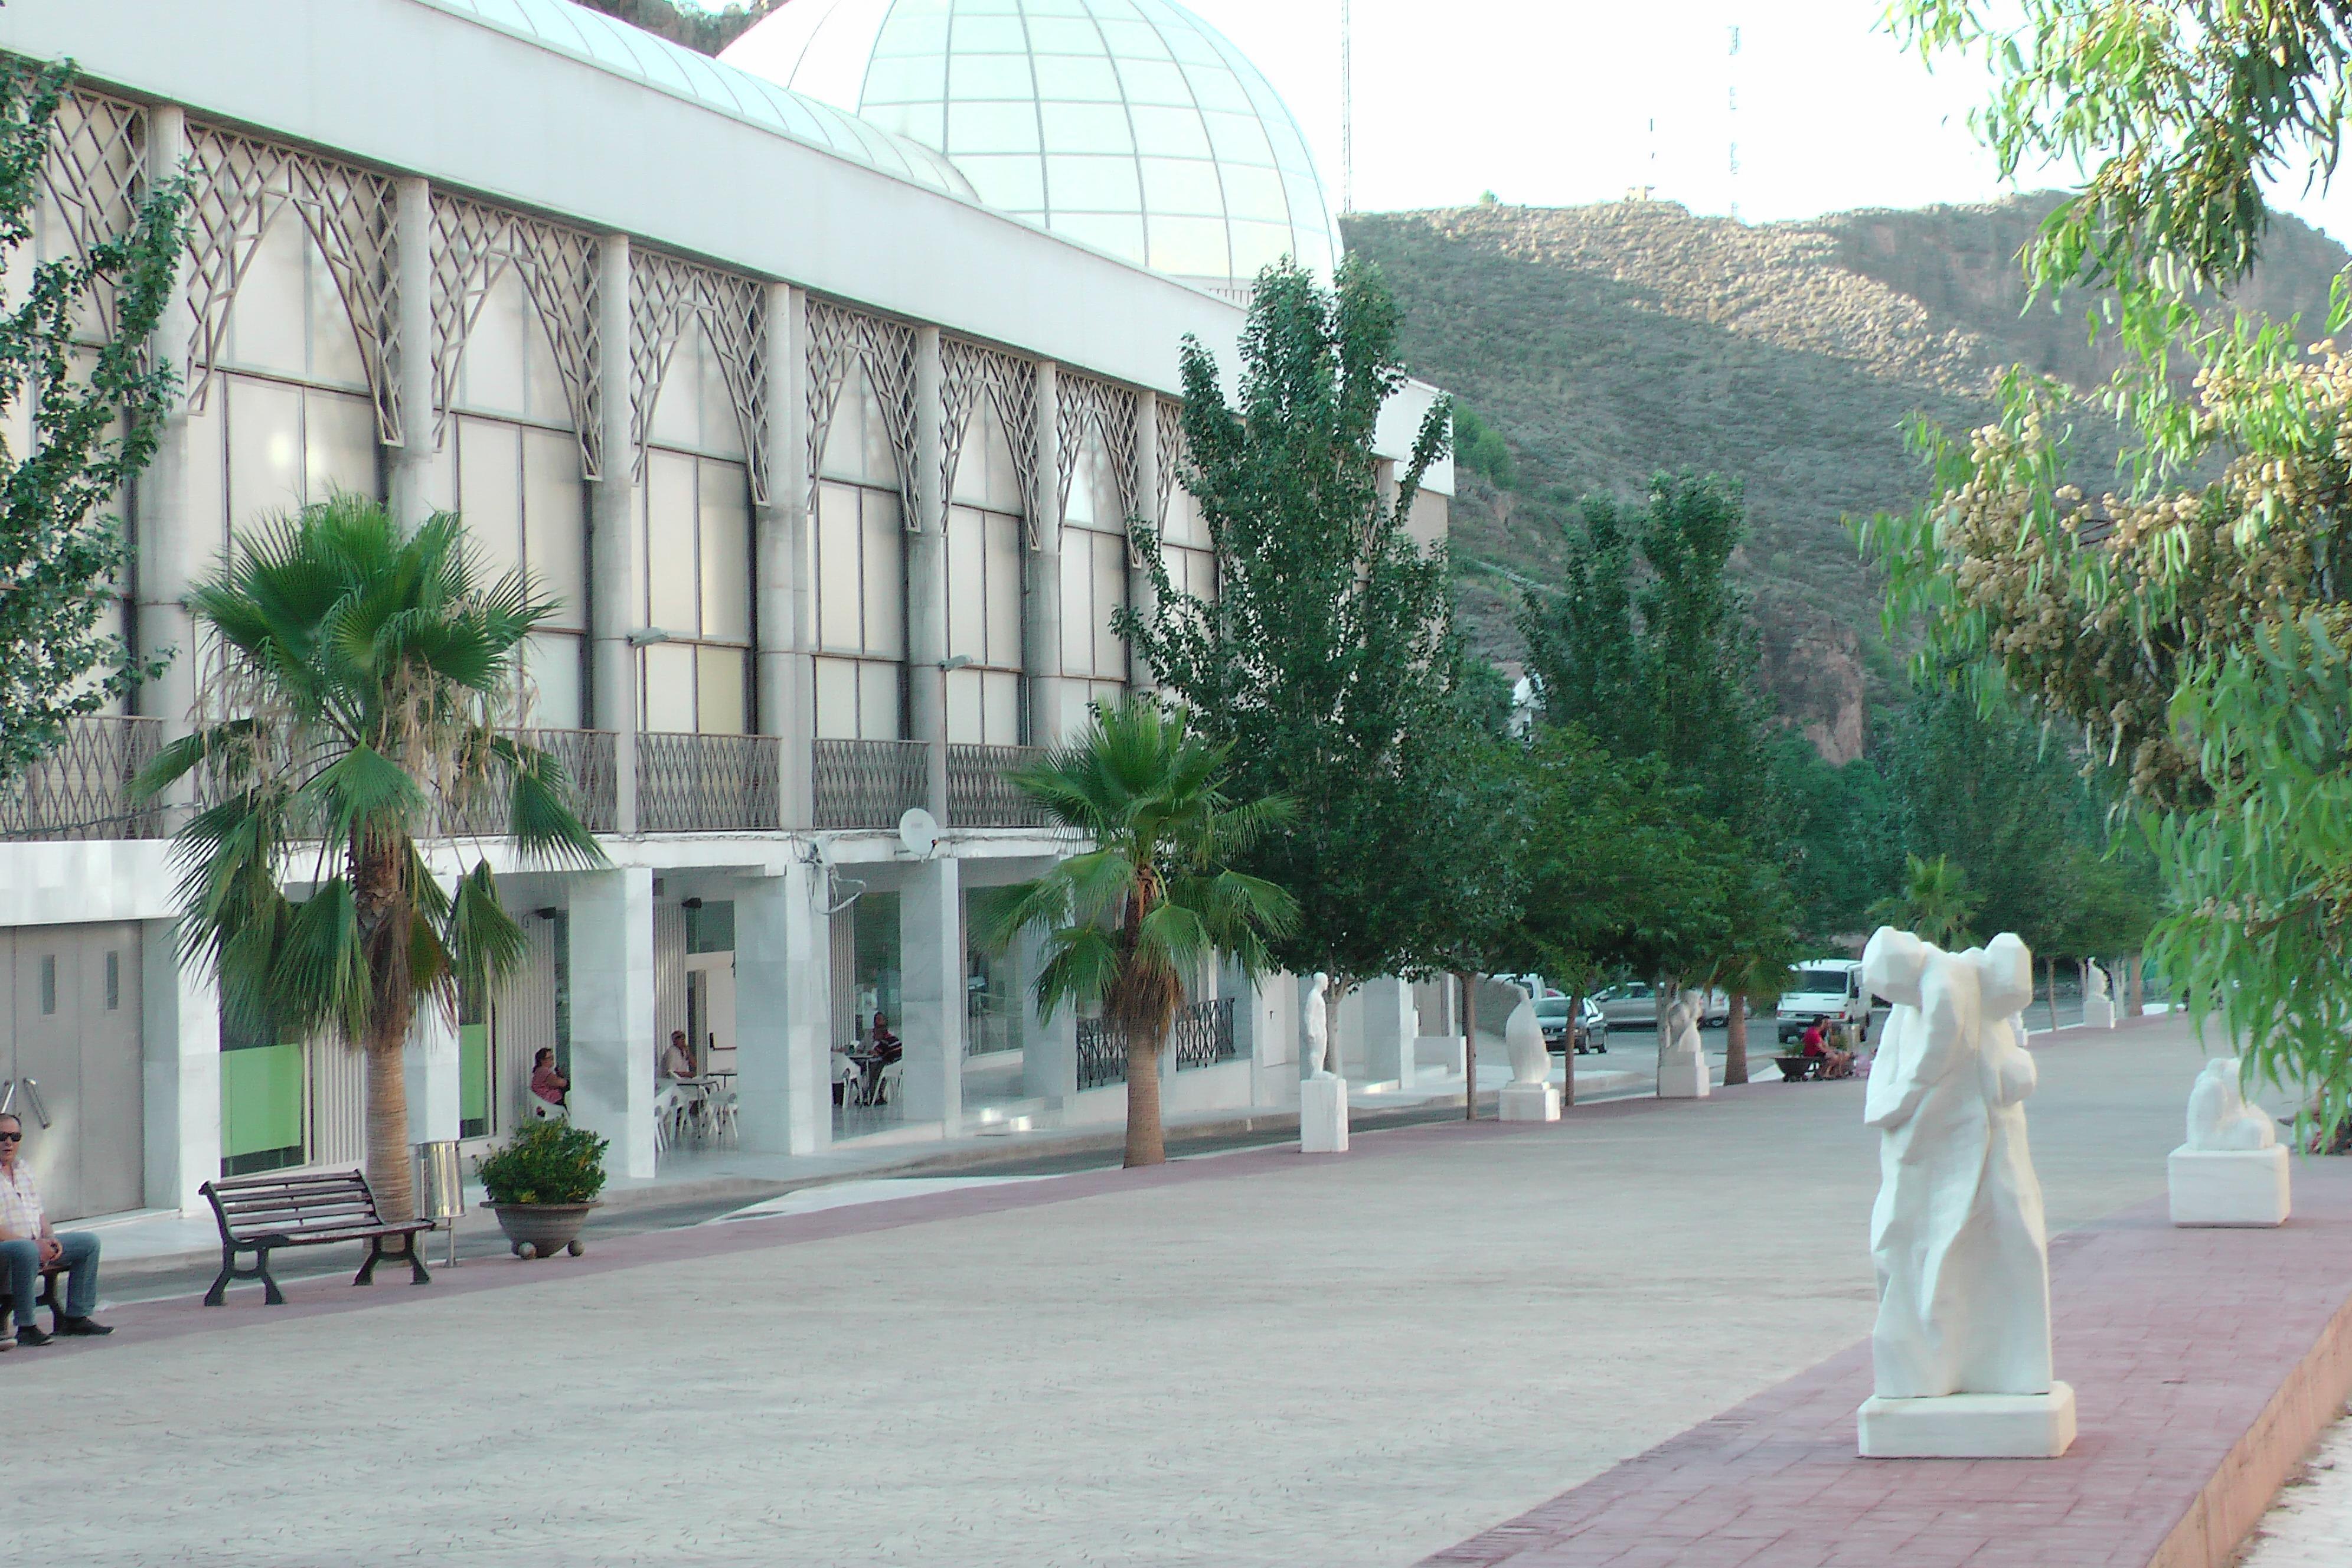 El Bulevar